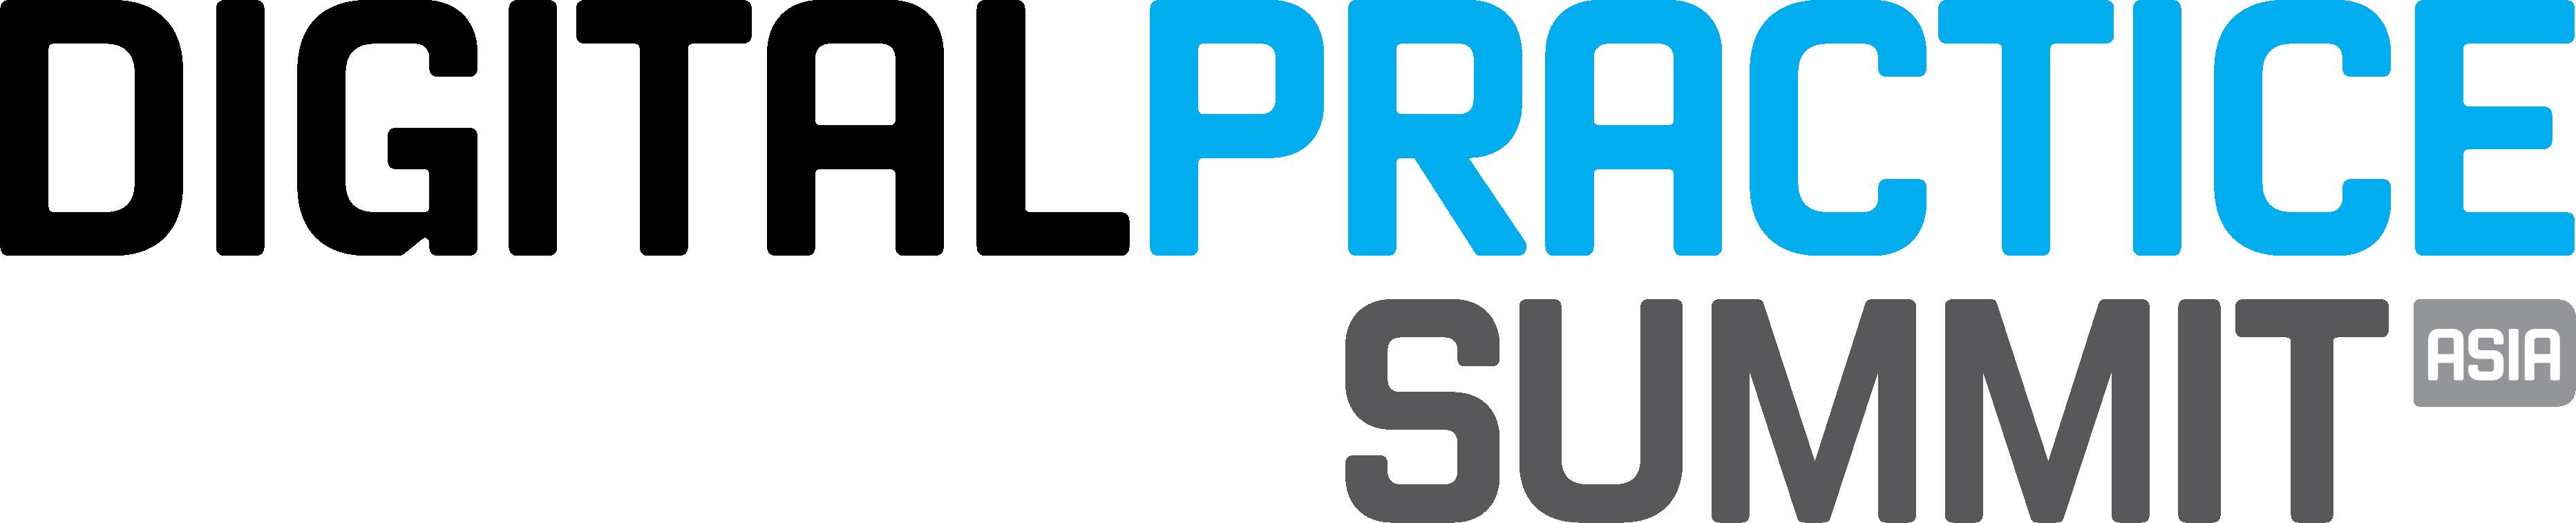 Digital Practice Summit 2021